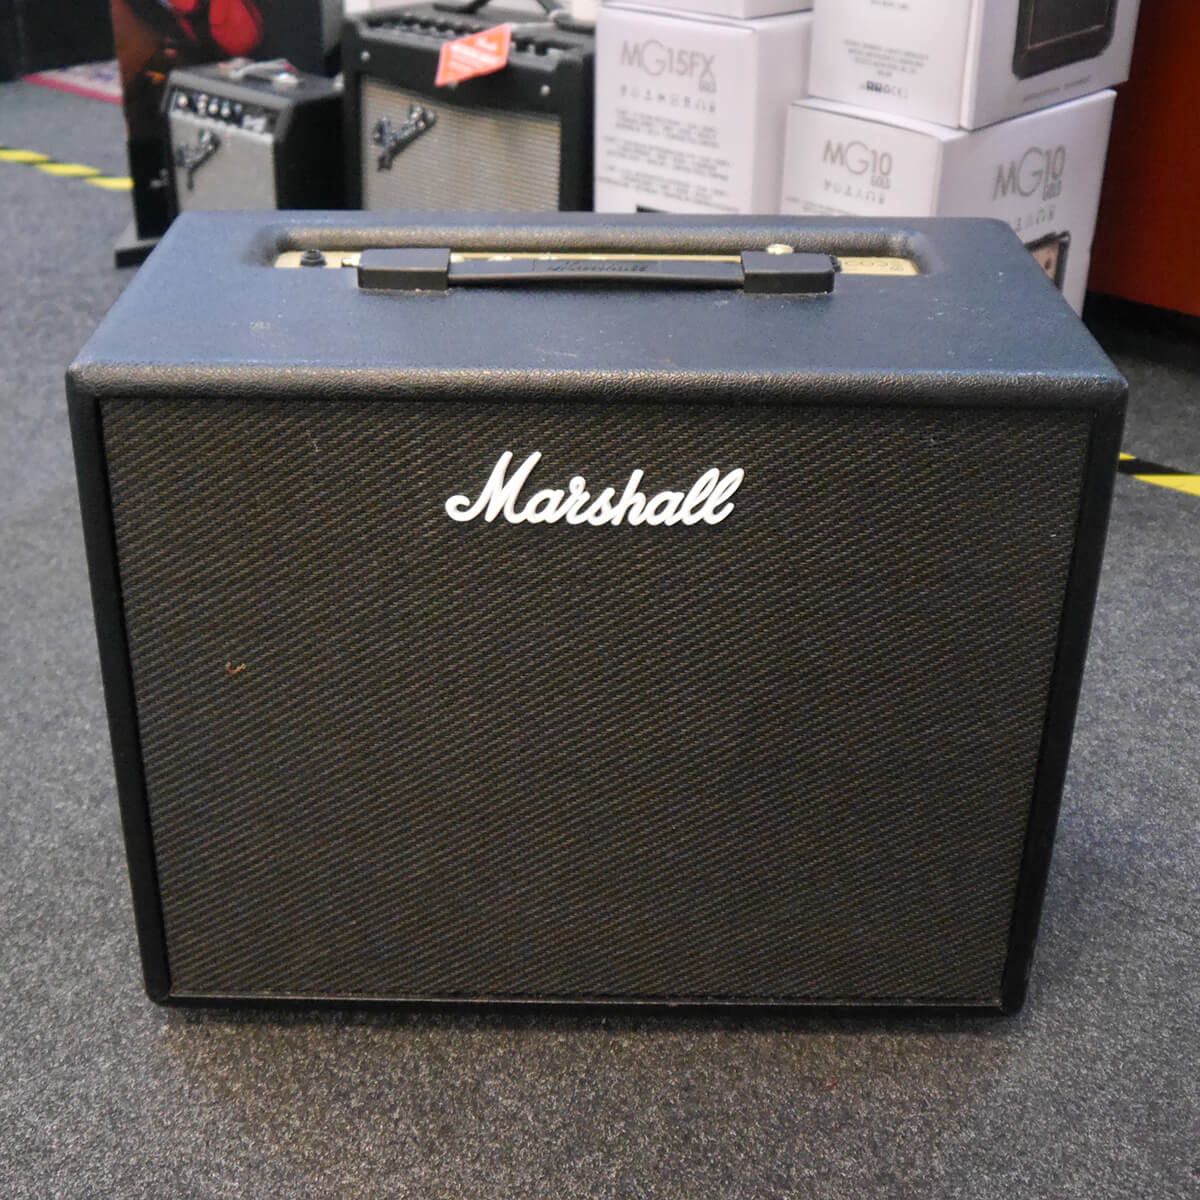 Marshall Code 50 Combo Amplifier - 2nd Hand